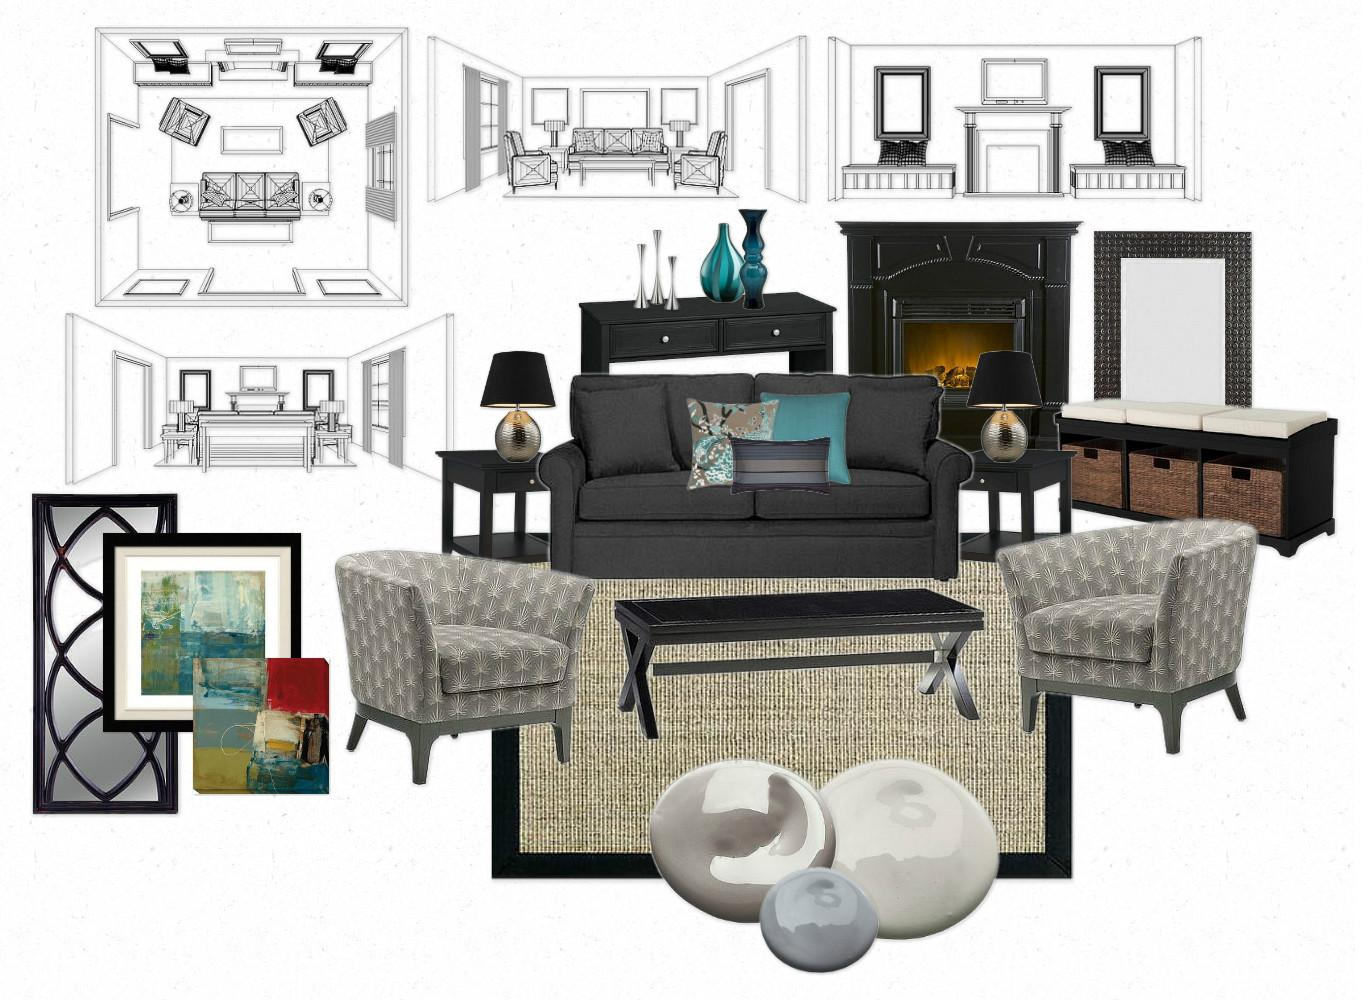 Newnan Interior Design Design Vision Boards For 2012! — Knox Furniture